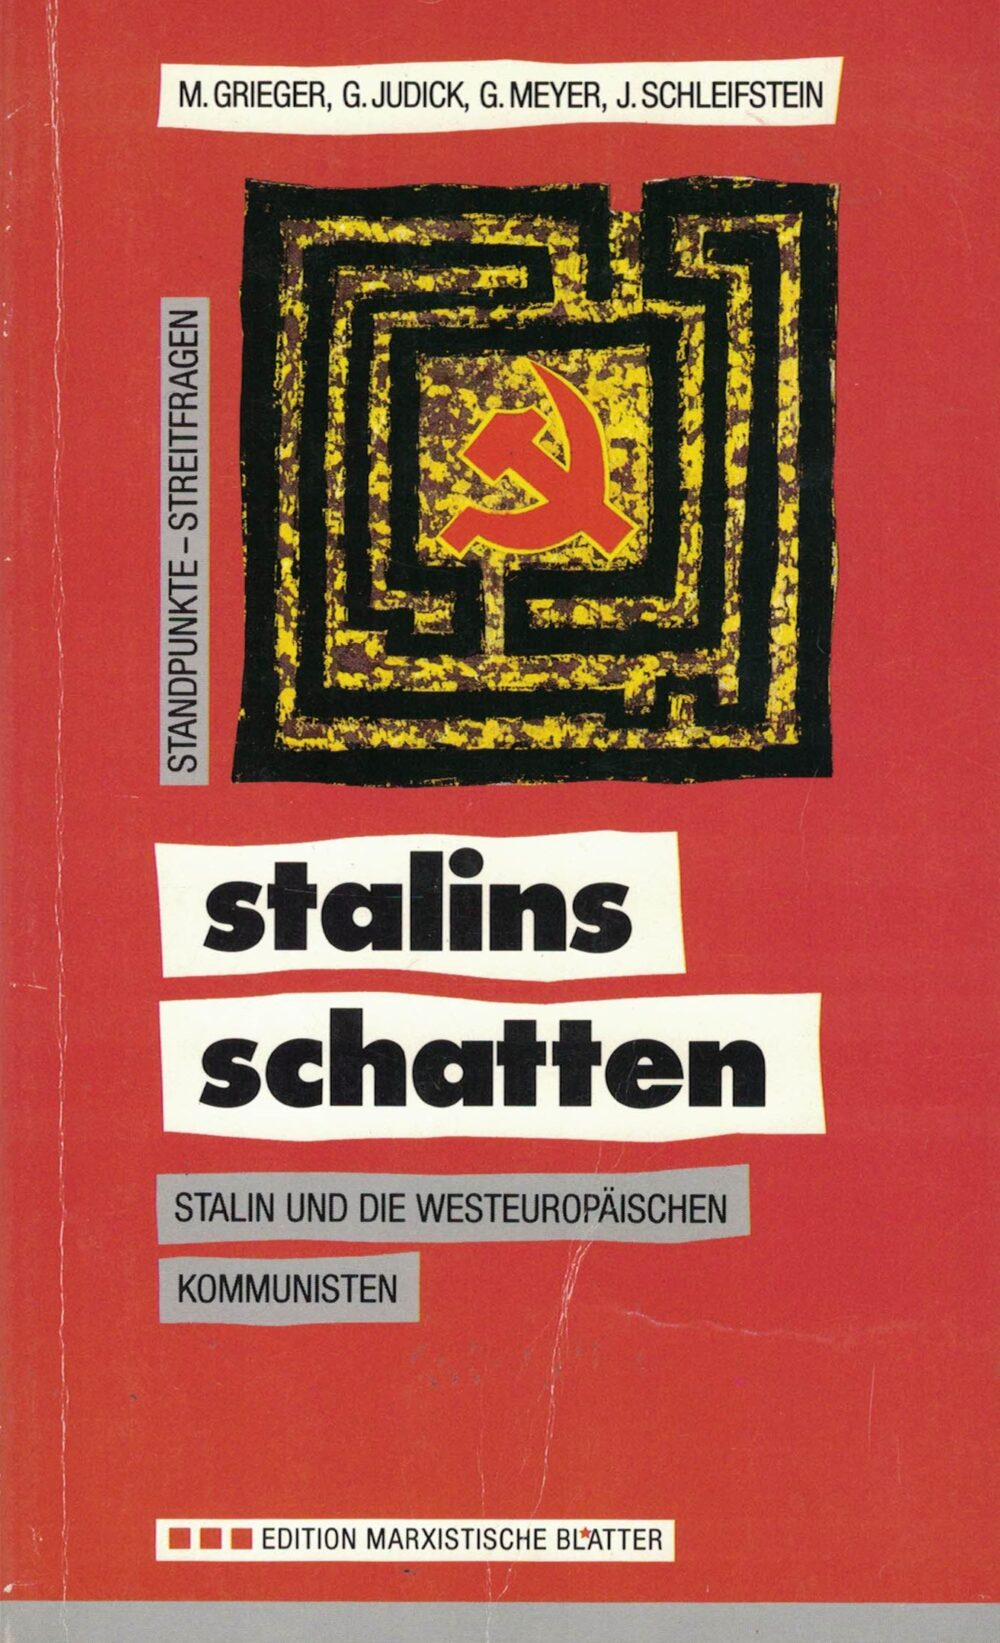 Günter Judick, Kurt Steinhaus (Herausgeber) - stalins schatten - stalin bewältigen